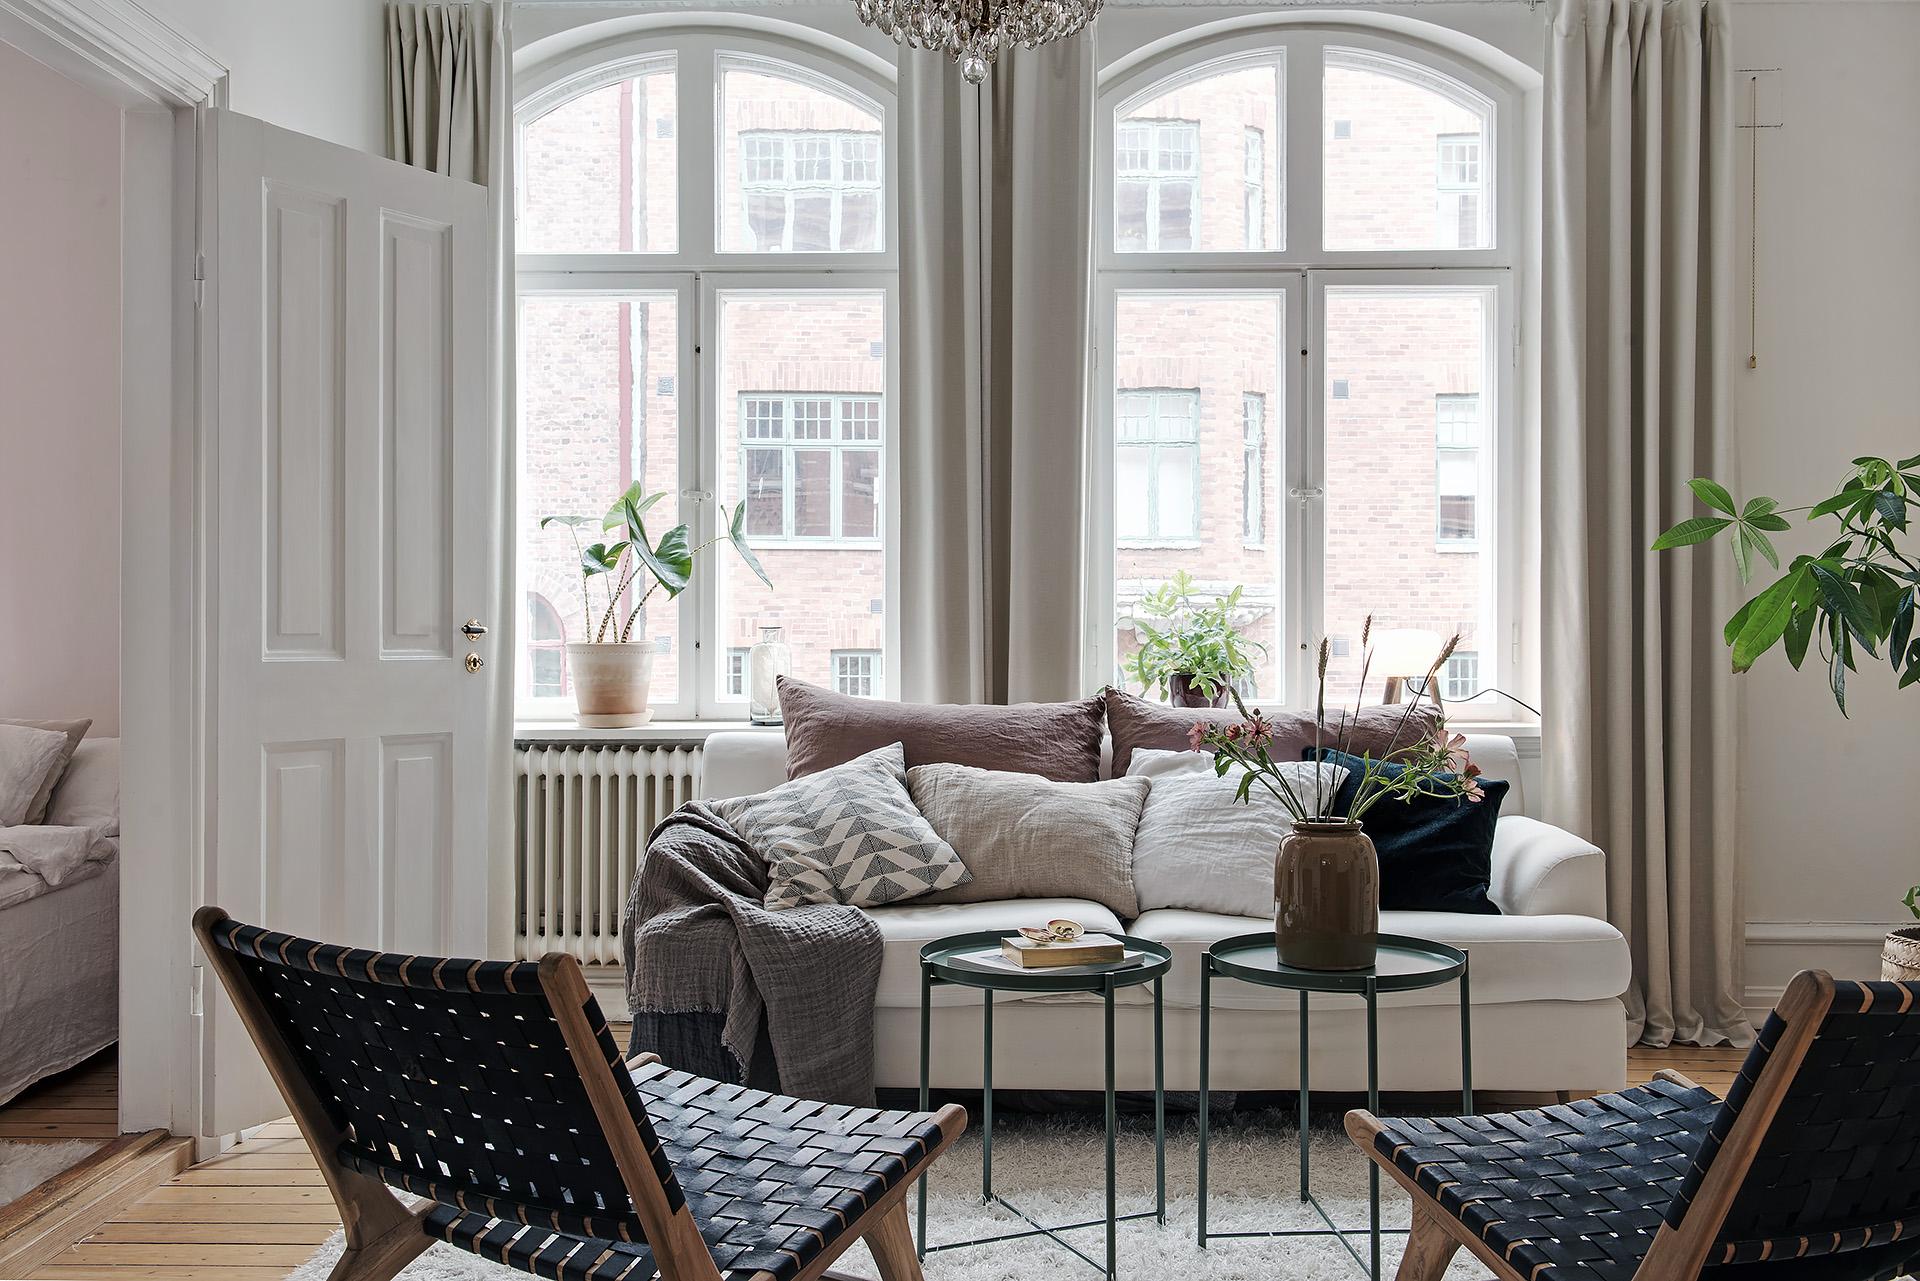 Interiores Chic   Blog de decoración nórdica   Blog de interiorismo ...